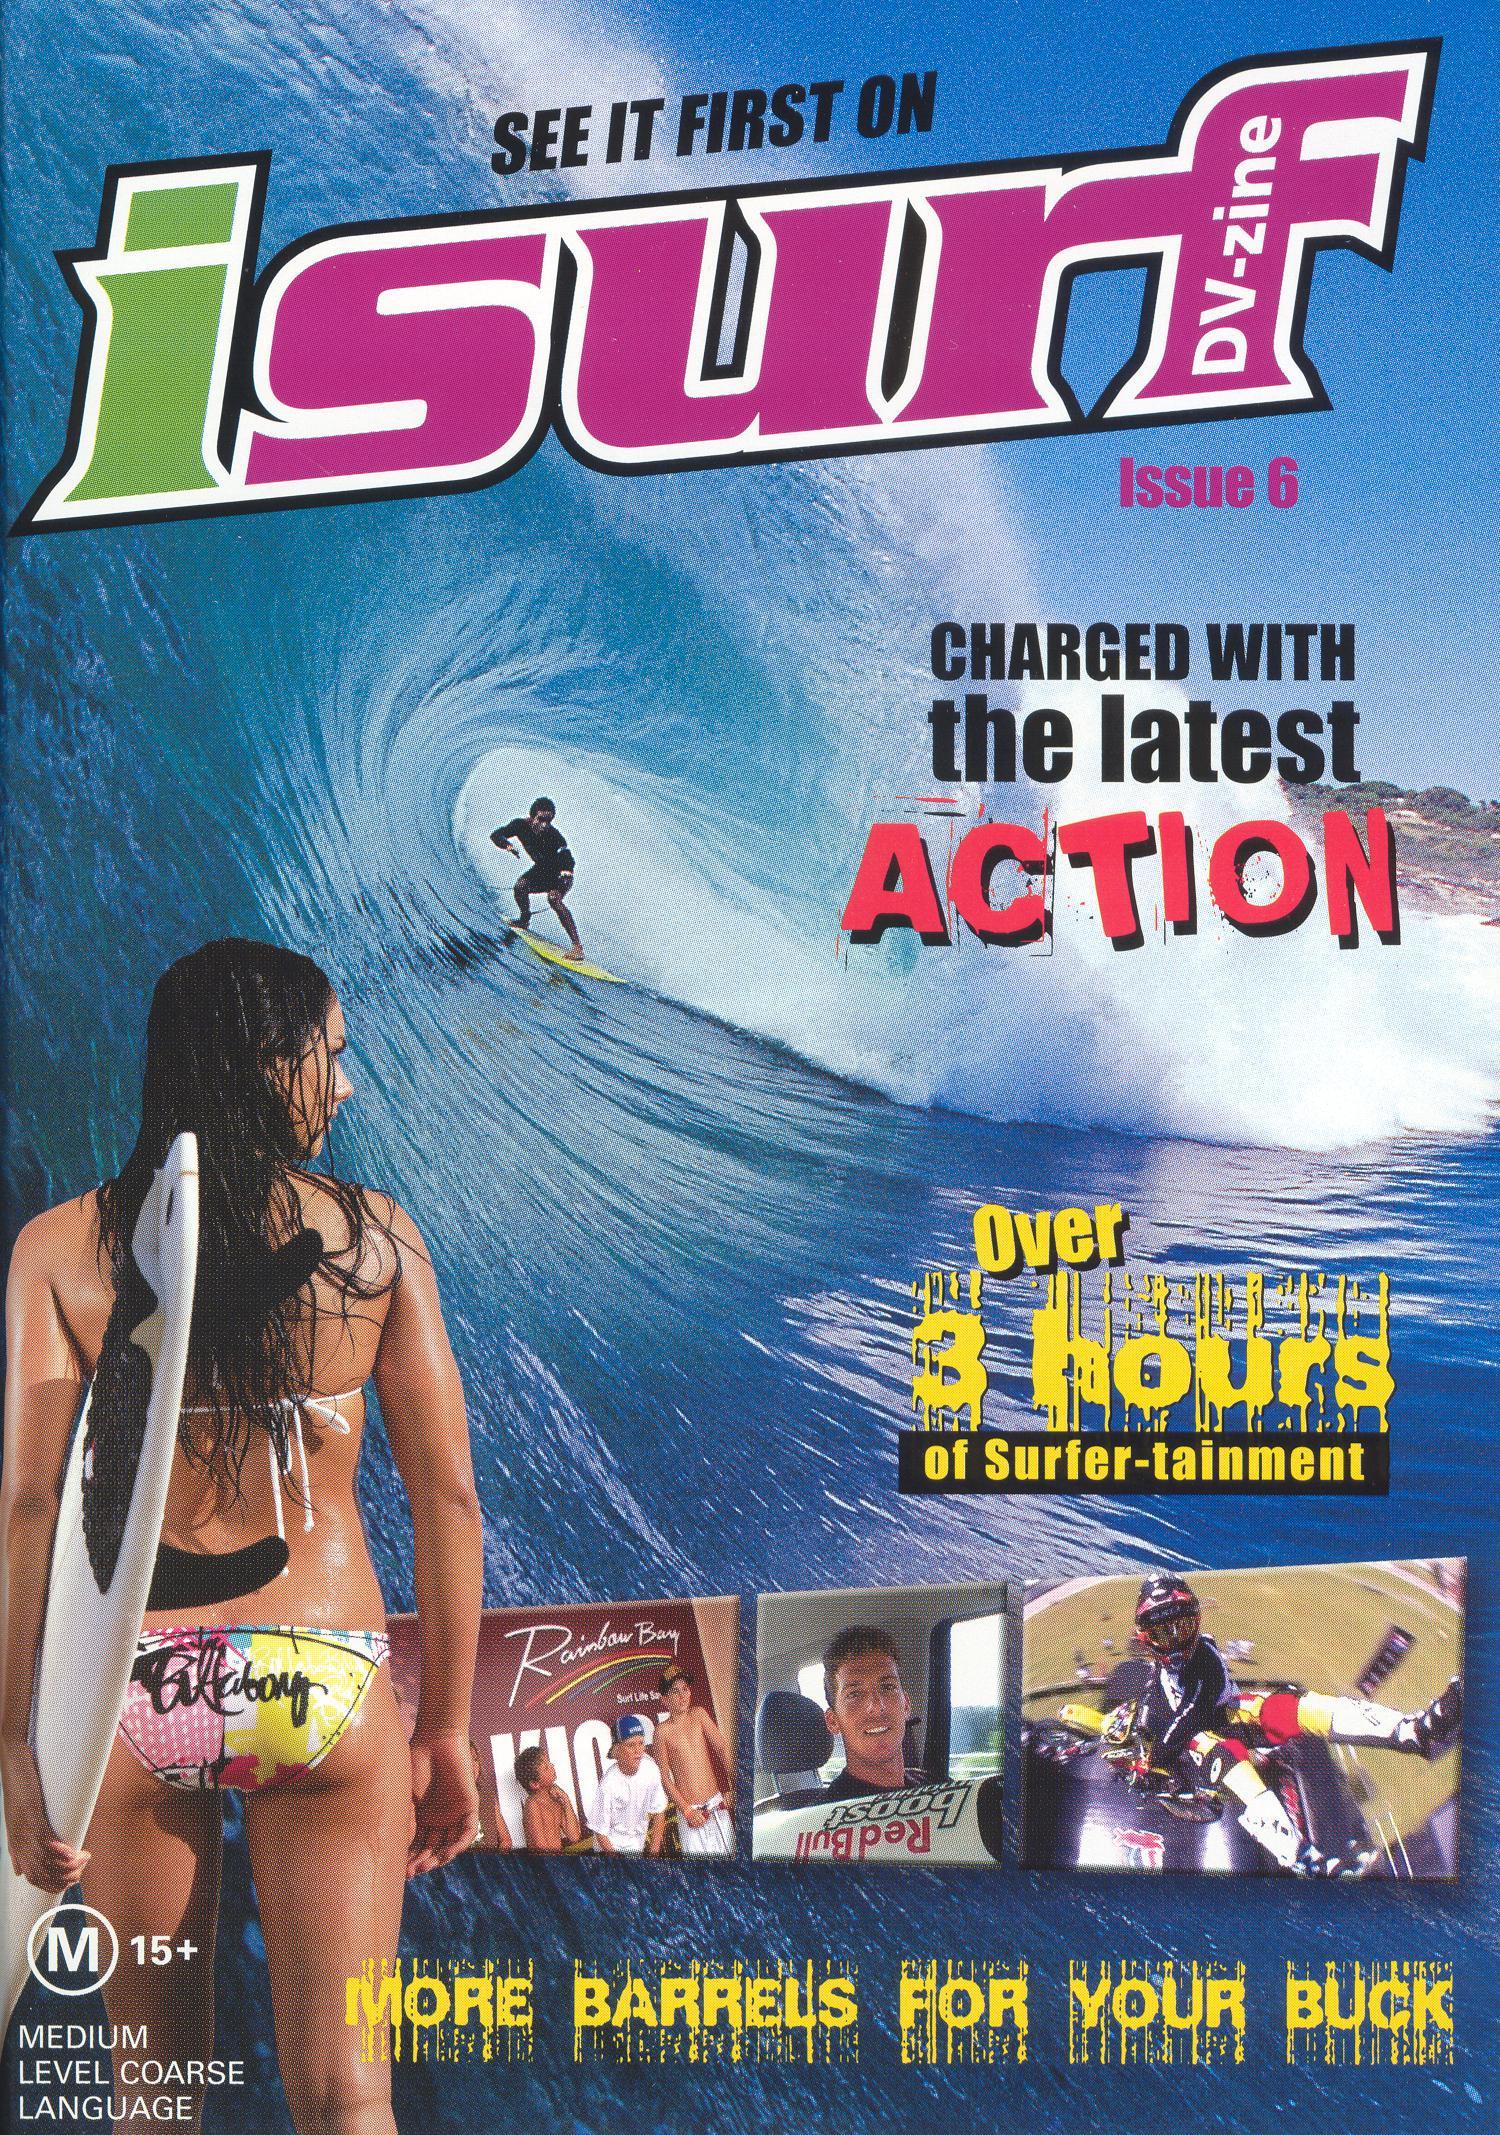 Isurf DV-Zine Issue, Vol. 6